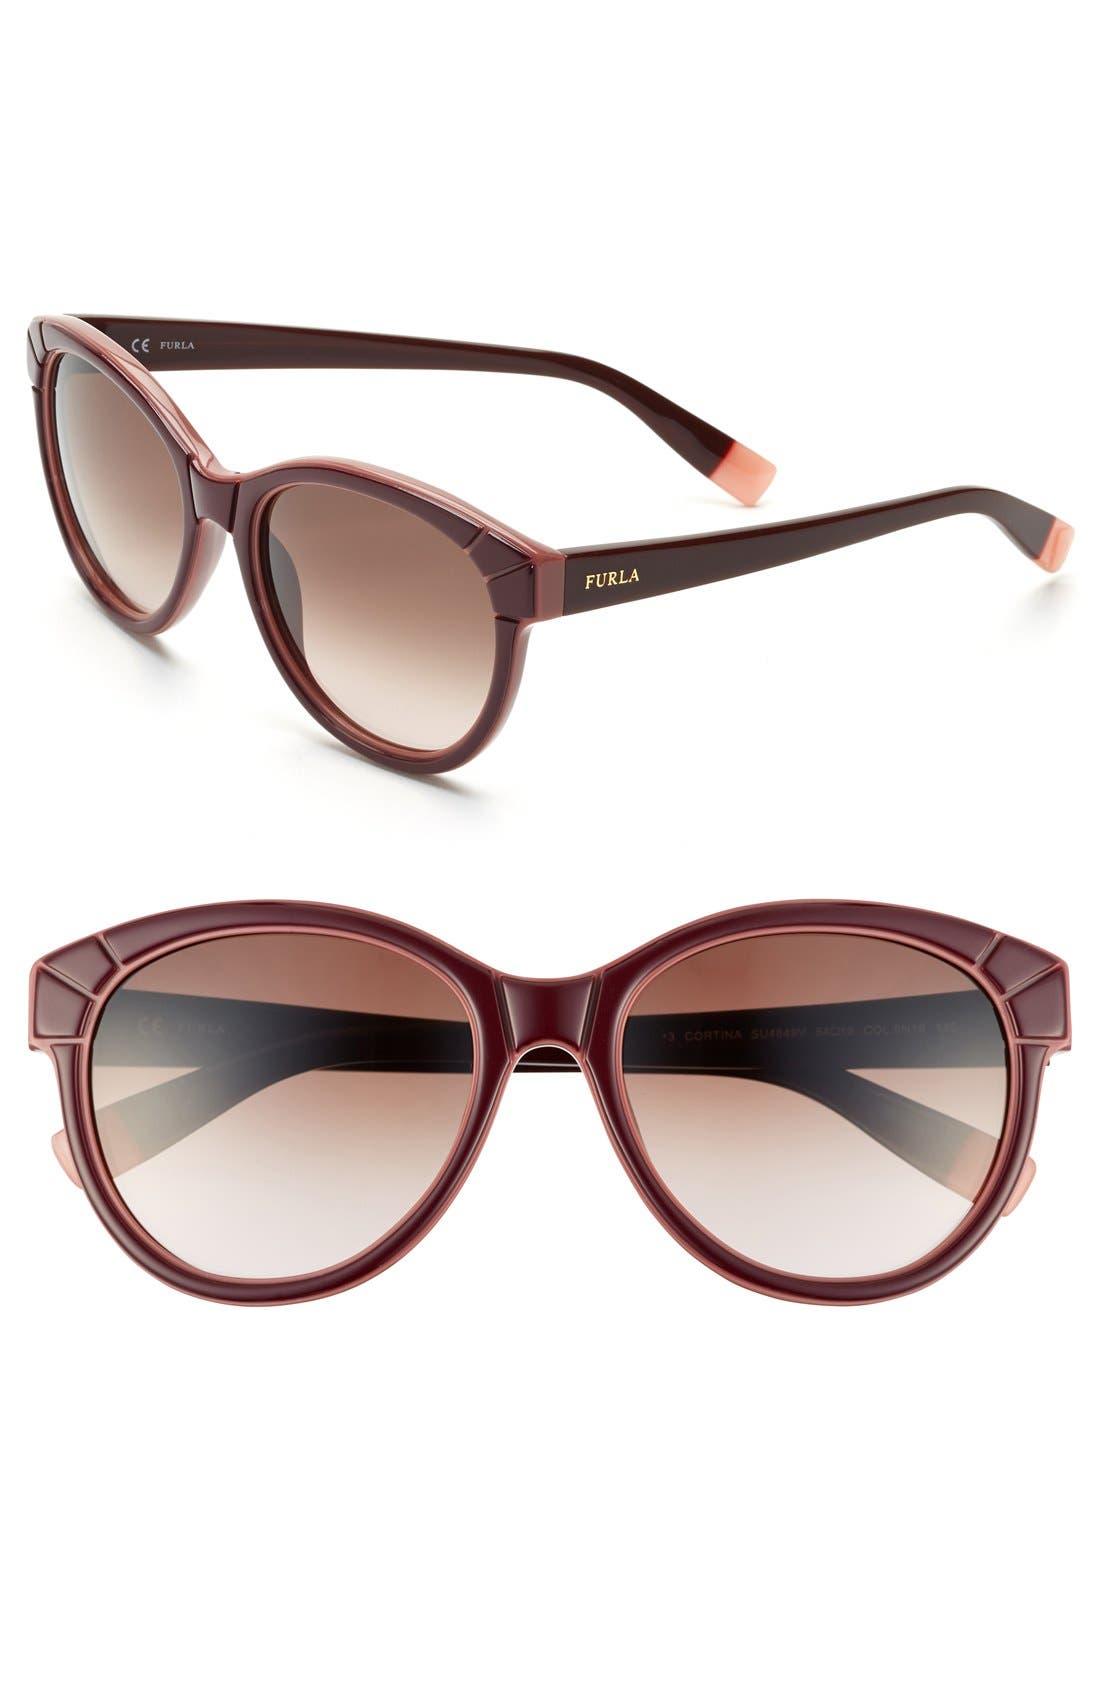 Main Image - Furla 54mm Sunglasses